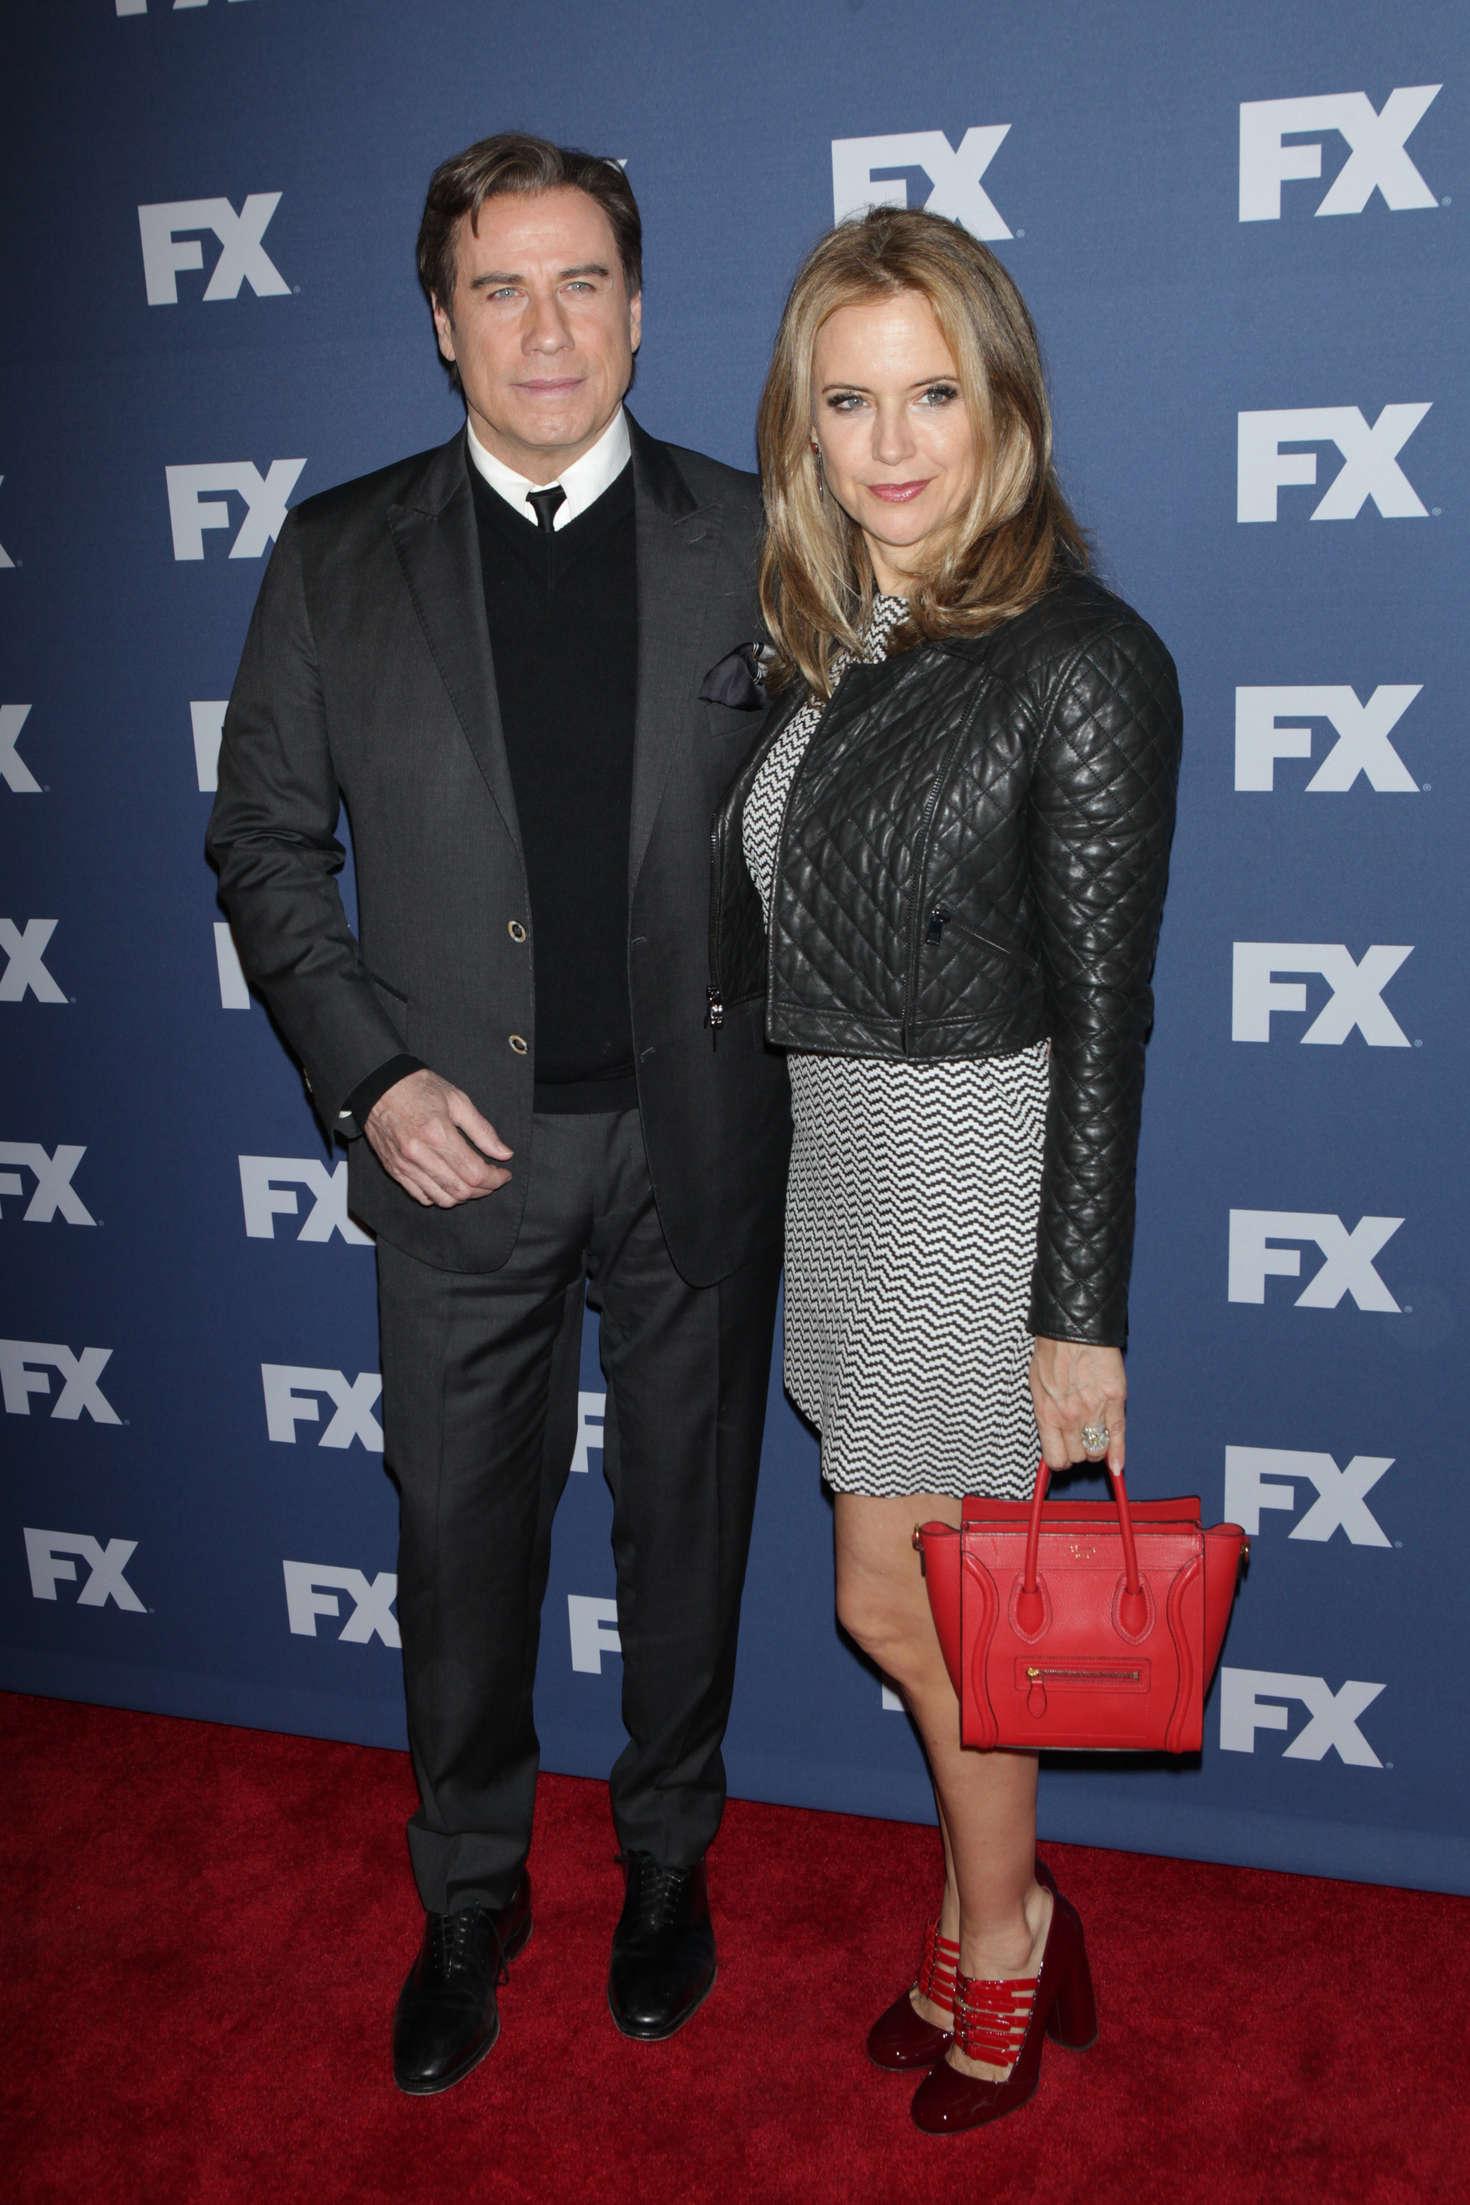 Kelly Preston People v. O.J. Simpson American Crime Story Premiere in New York